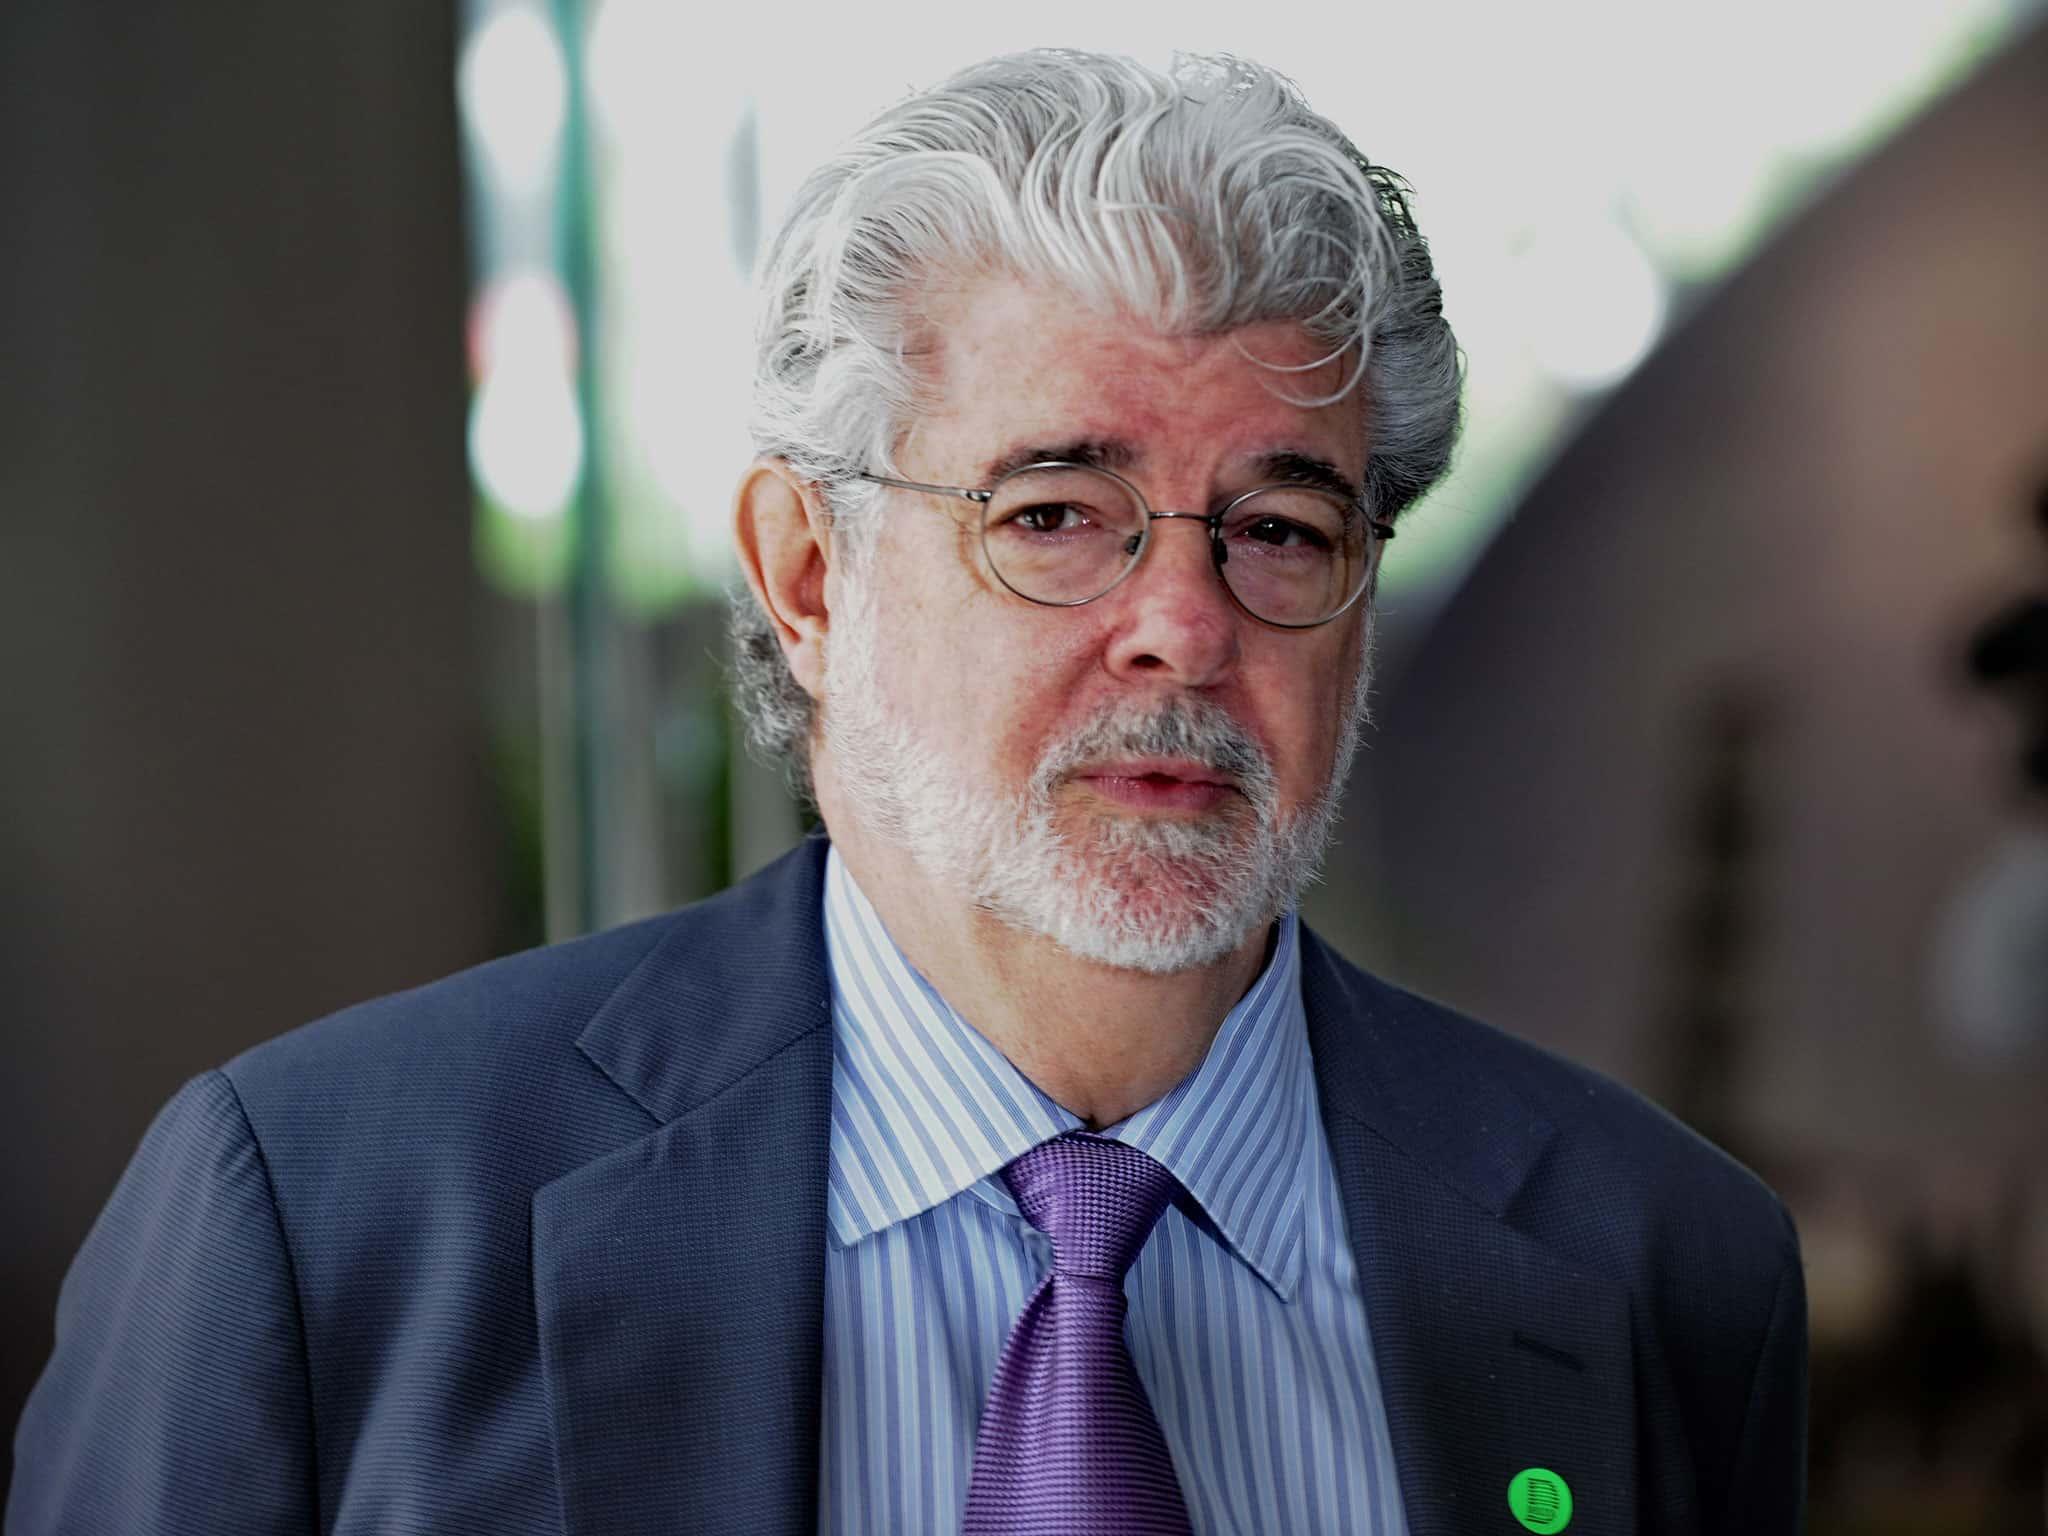 George Lucas – $5.4bn